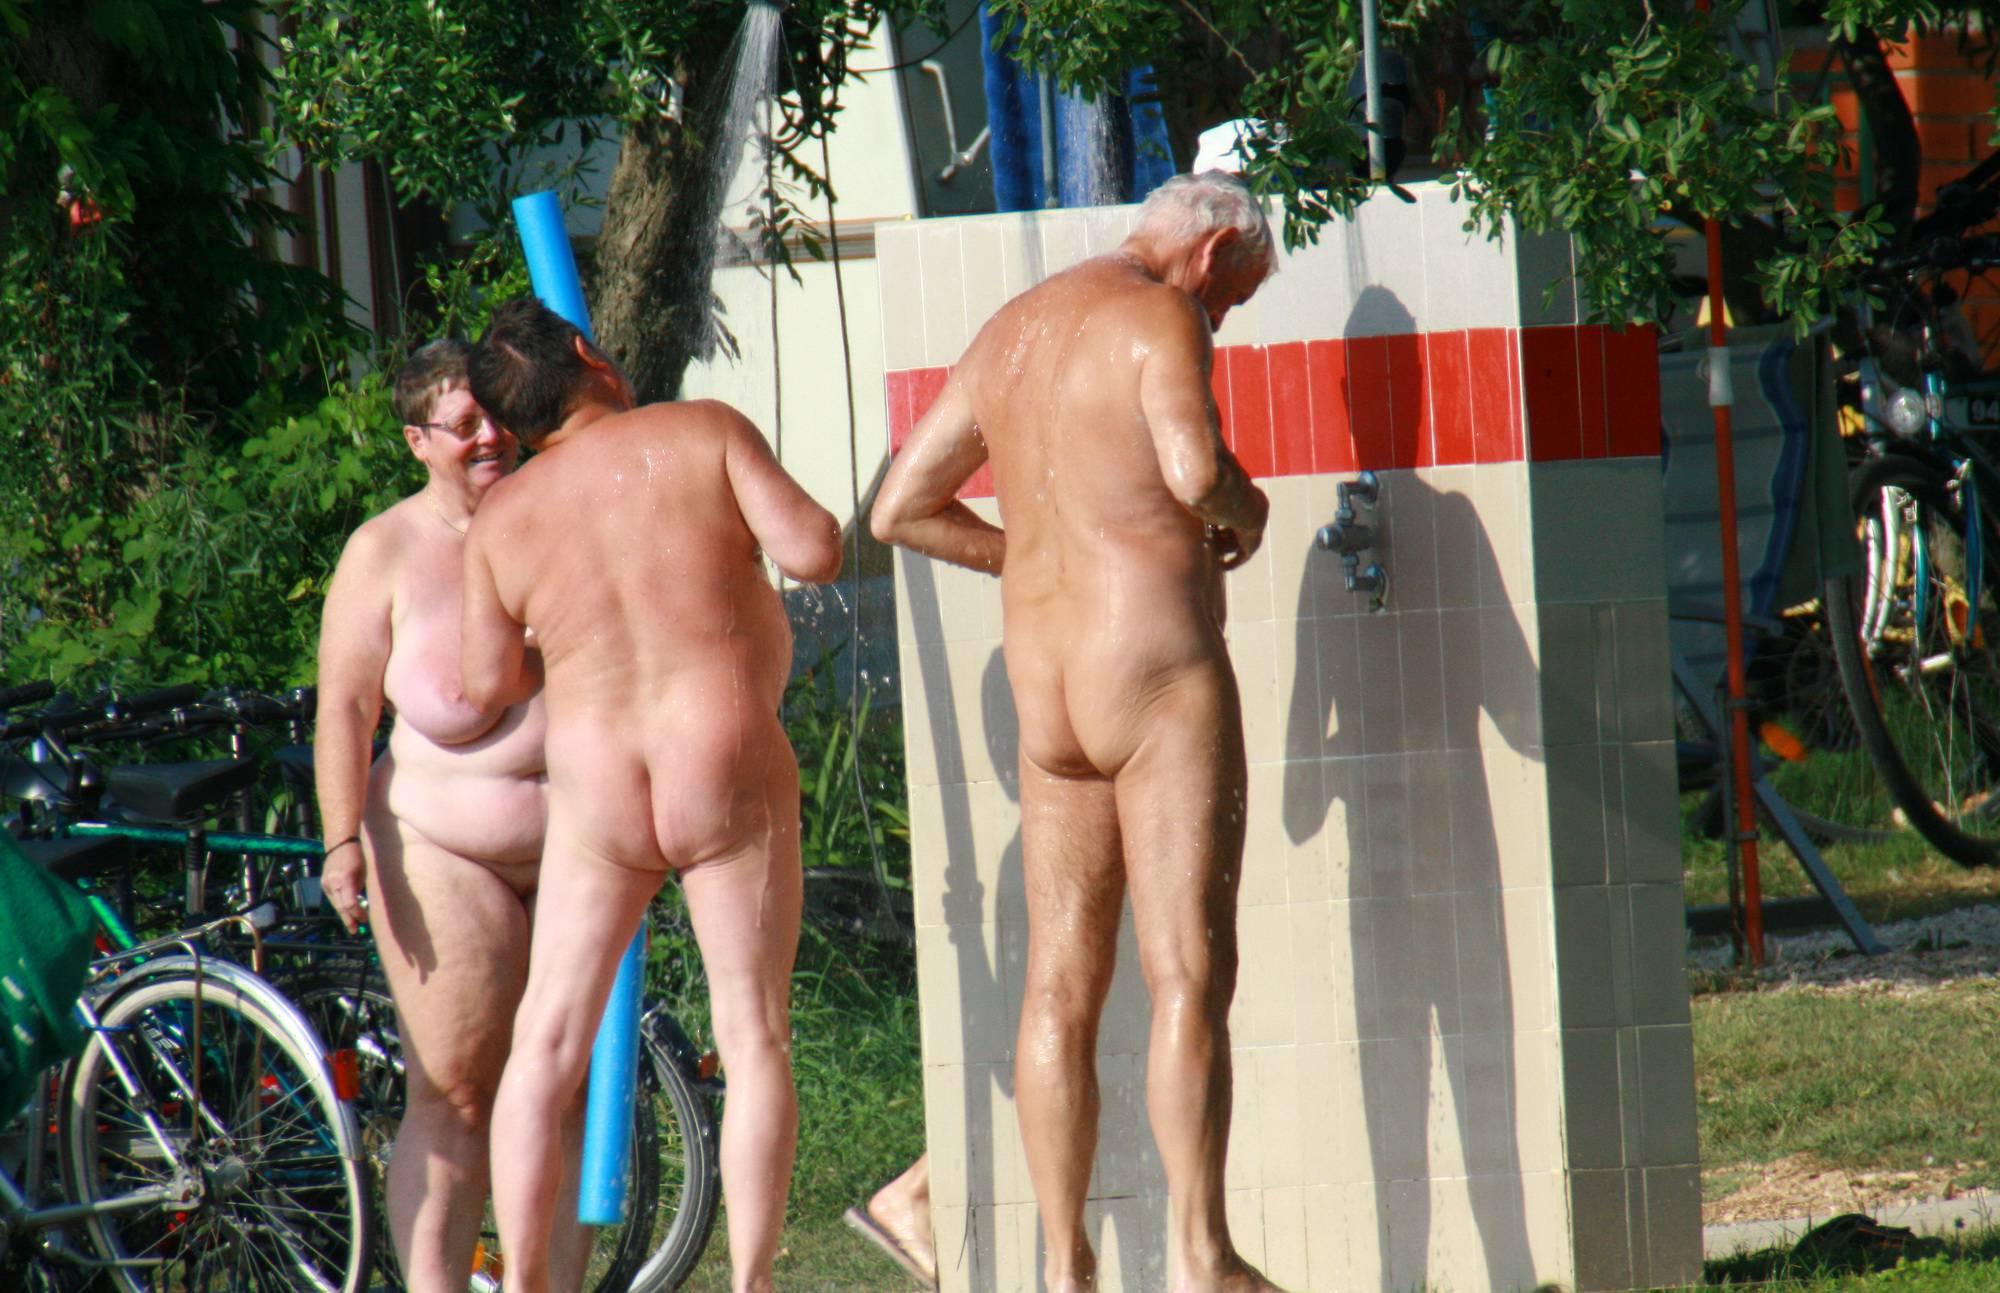 Nude Duet Friend Shower - 2